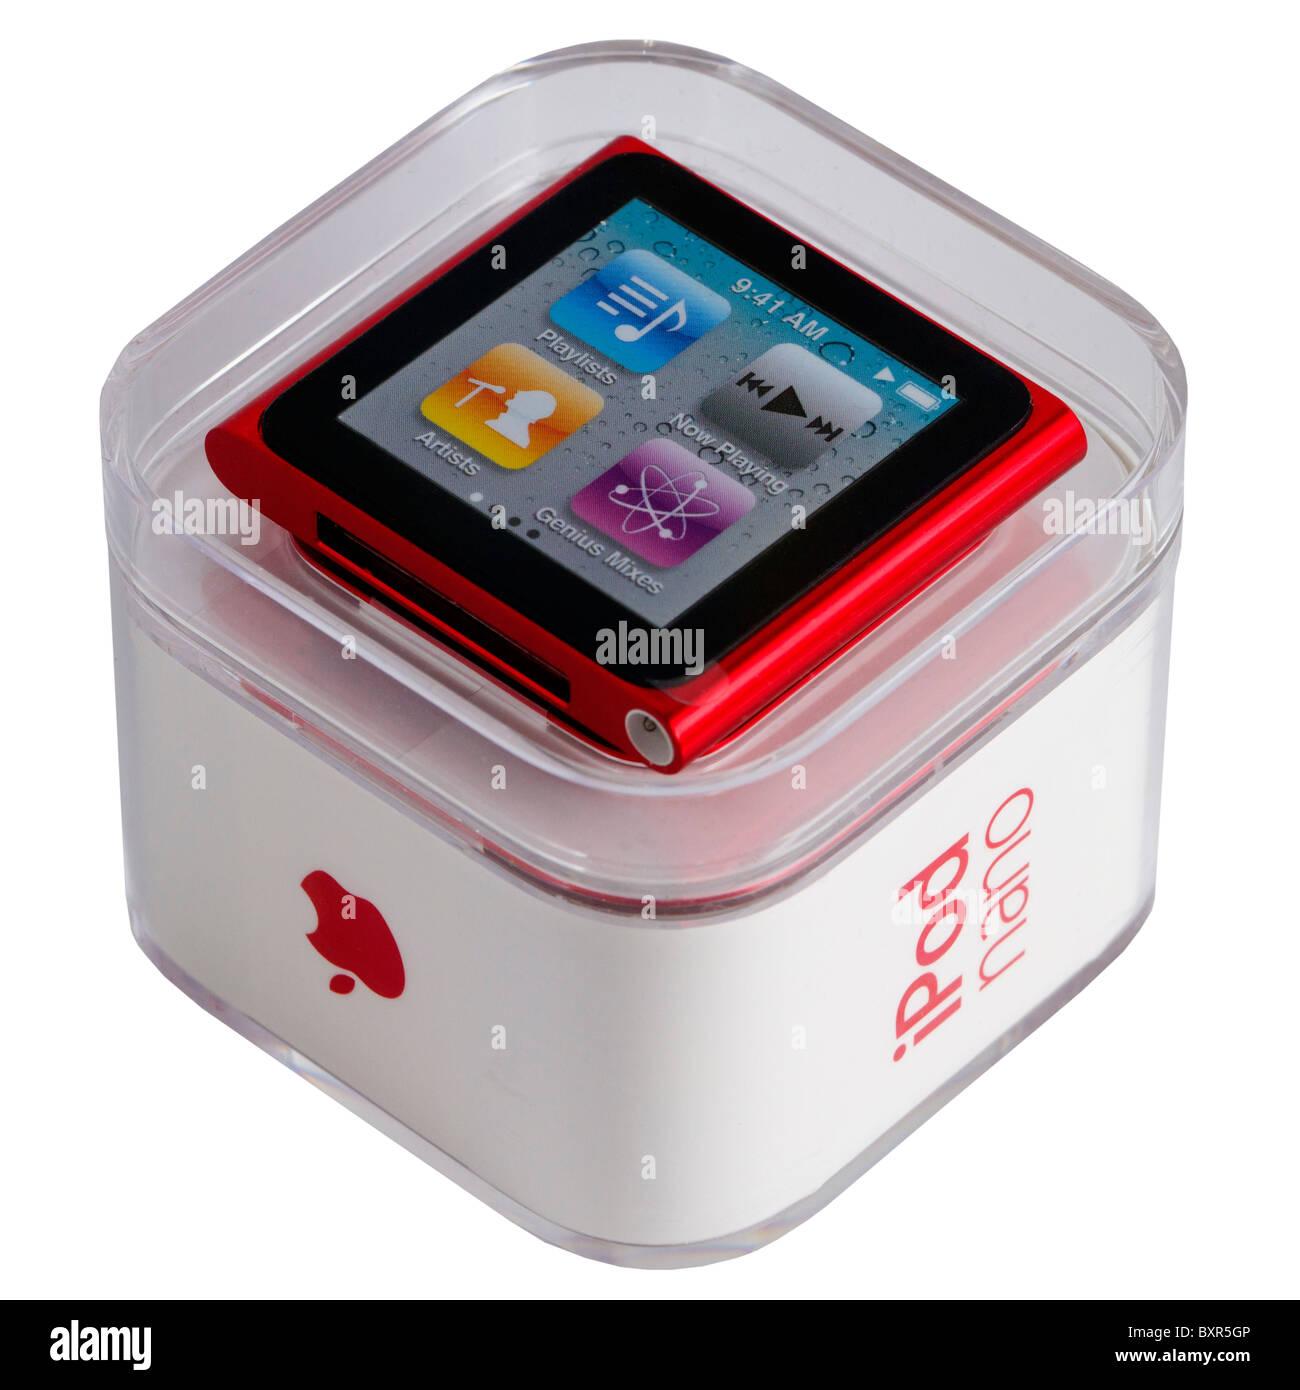 Apple iPod Nano, sixth generation, in its box, on white background